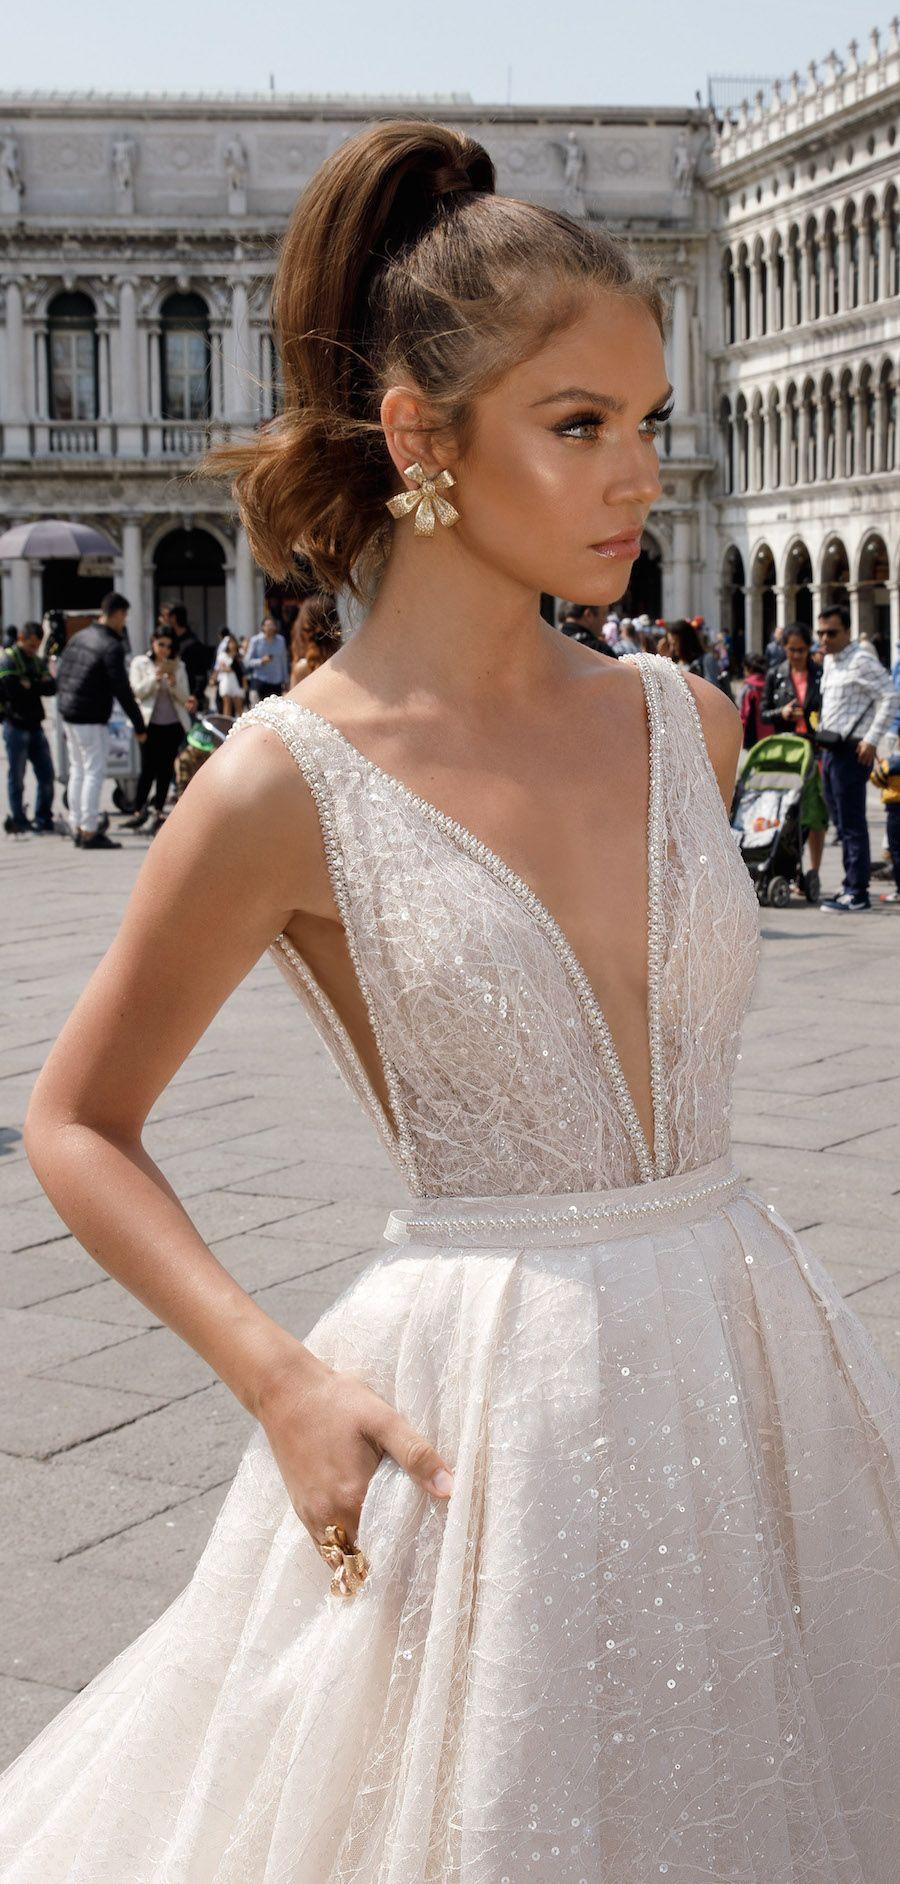 Wedding dresses by julie vino spring